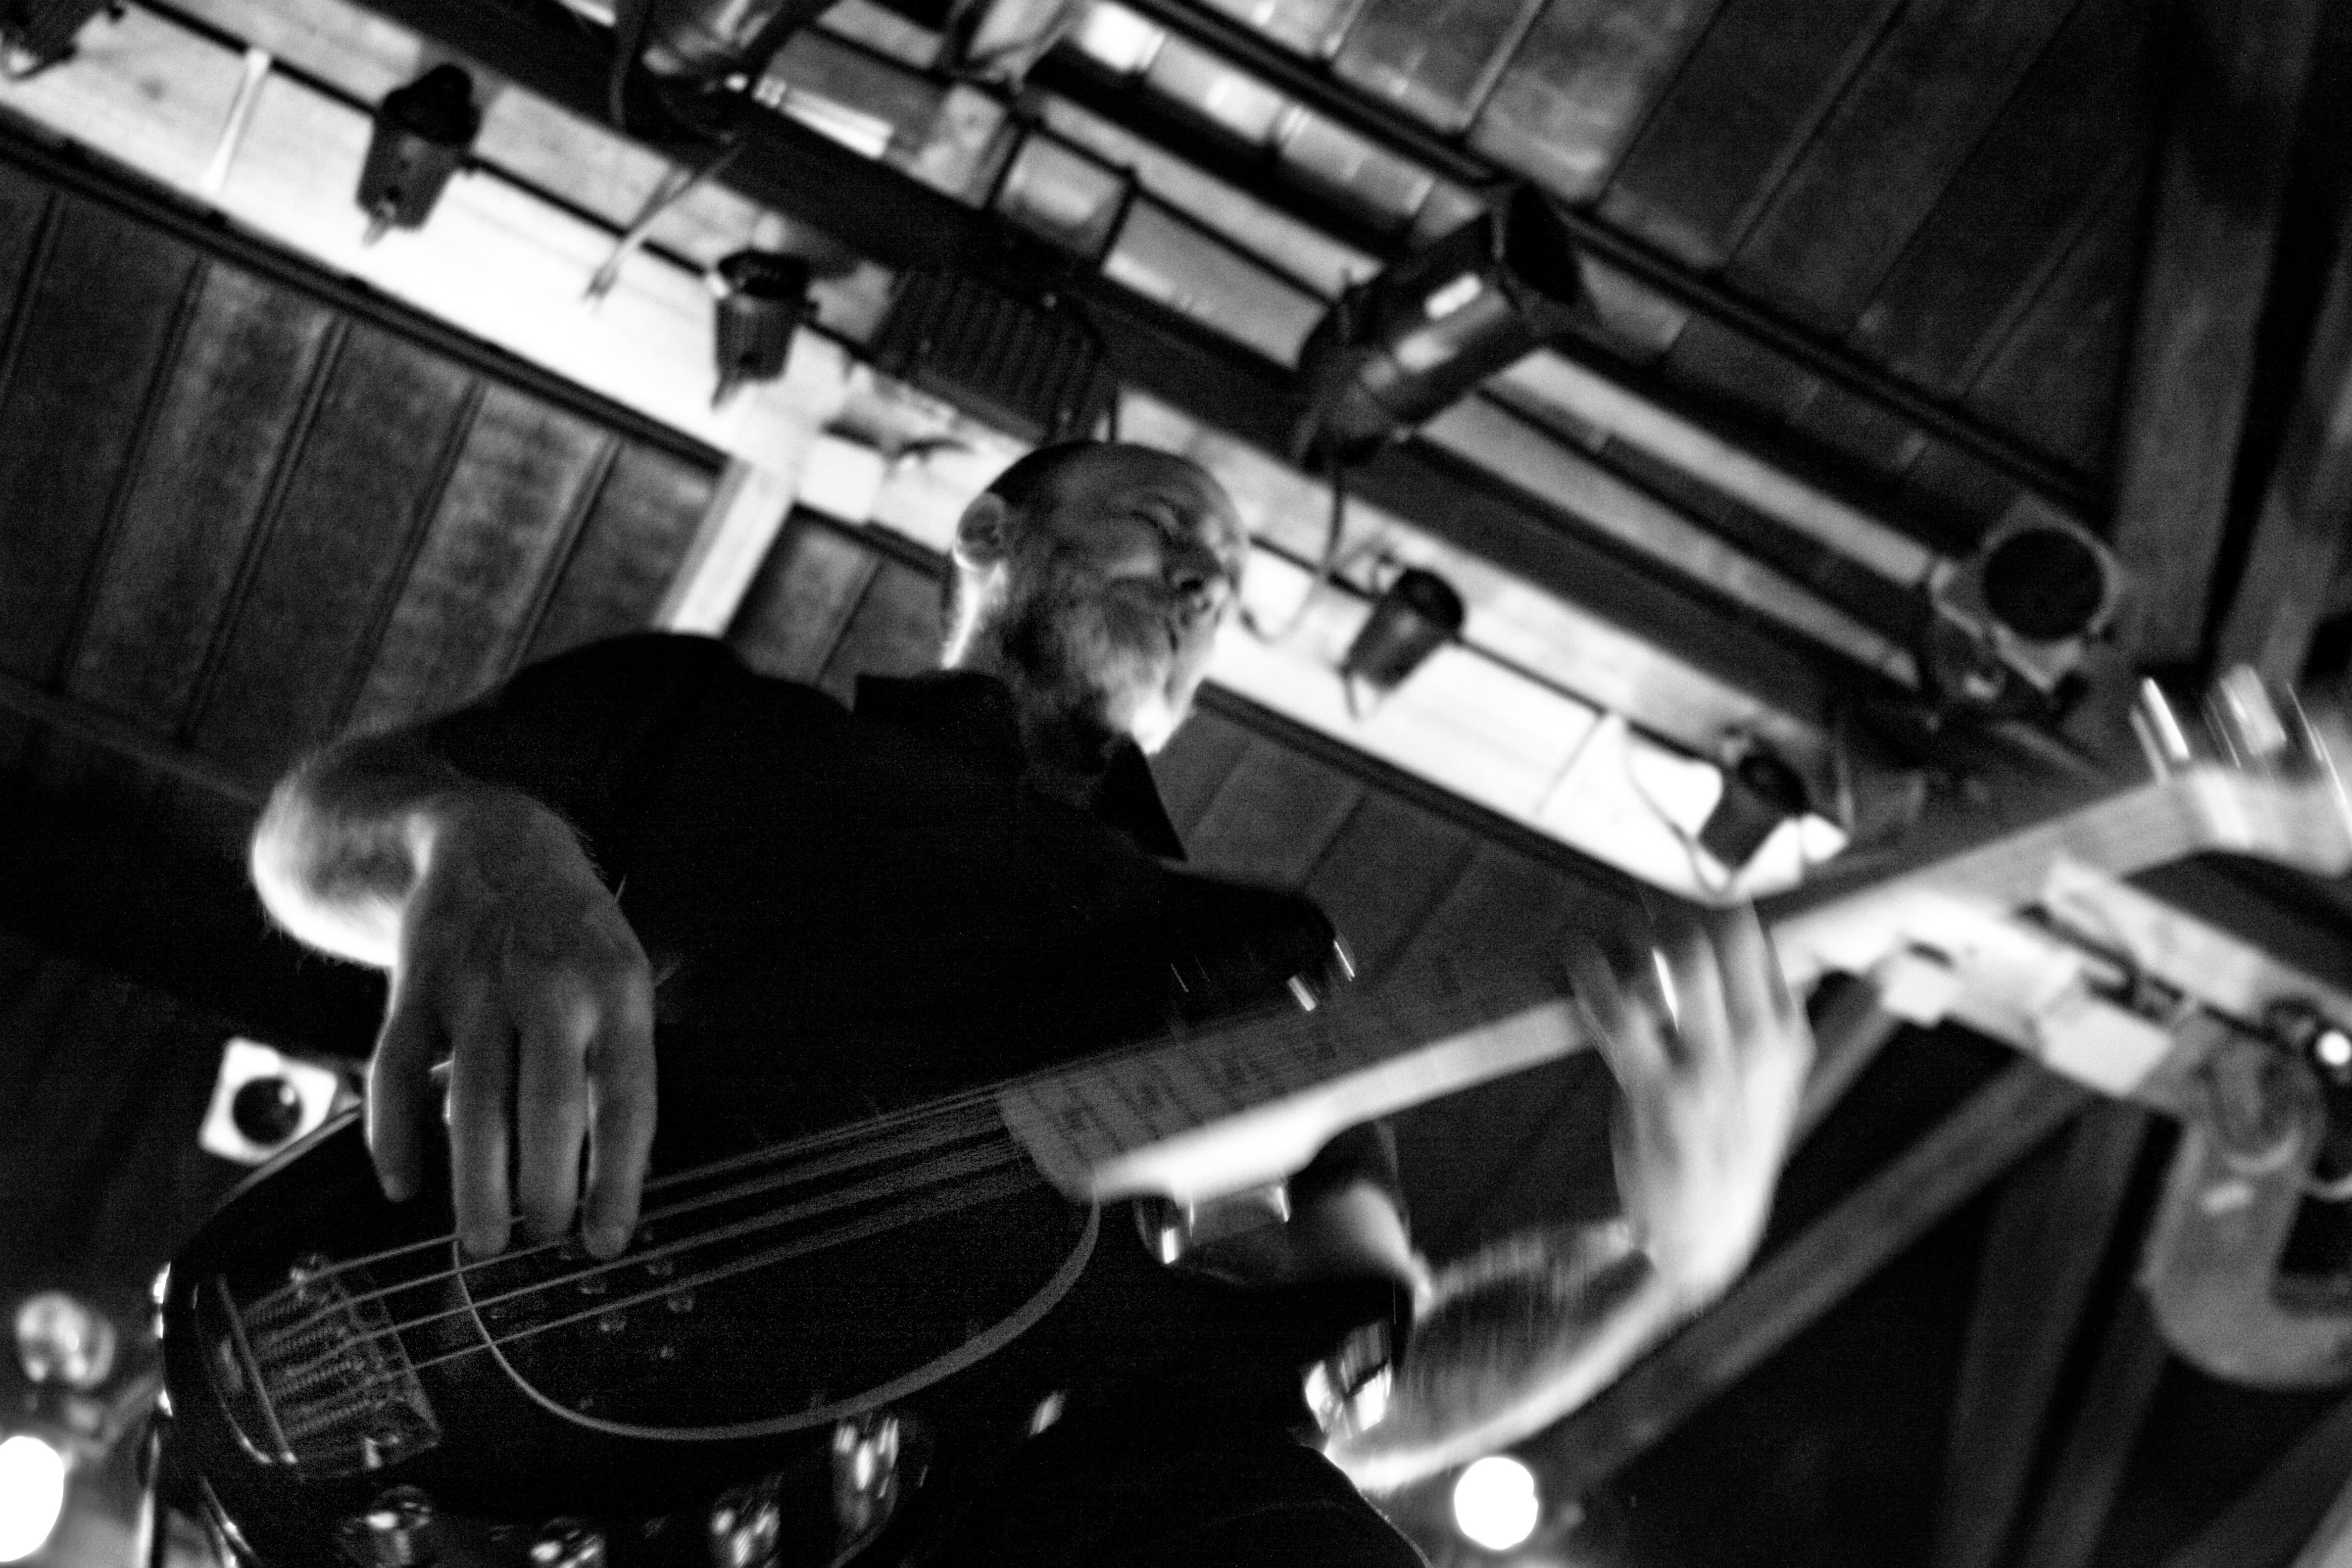 басист и ударник картинка марте богатые наследники